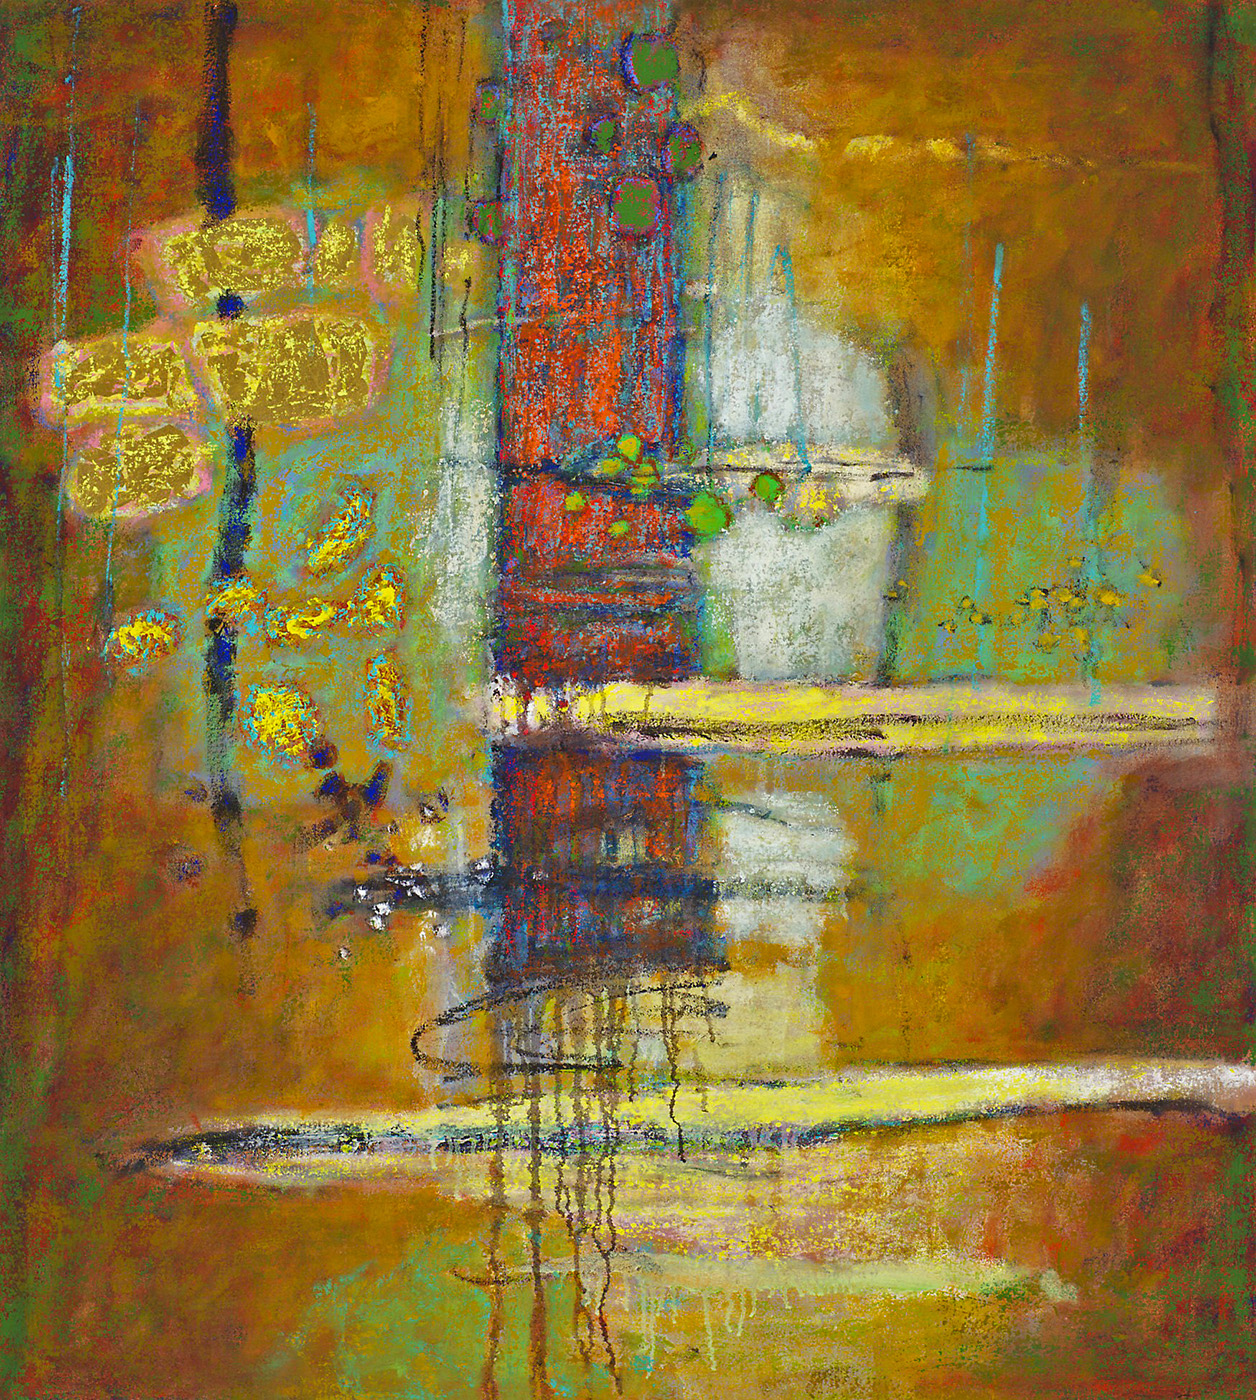 "Luminous Entity   | oil on canvas | 40 x 36"" | 2013"